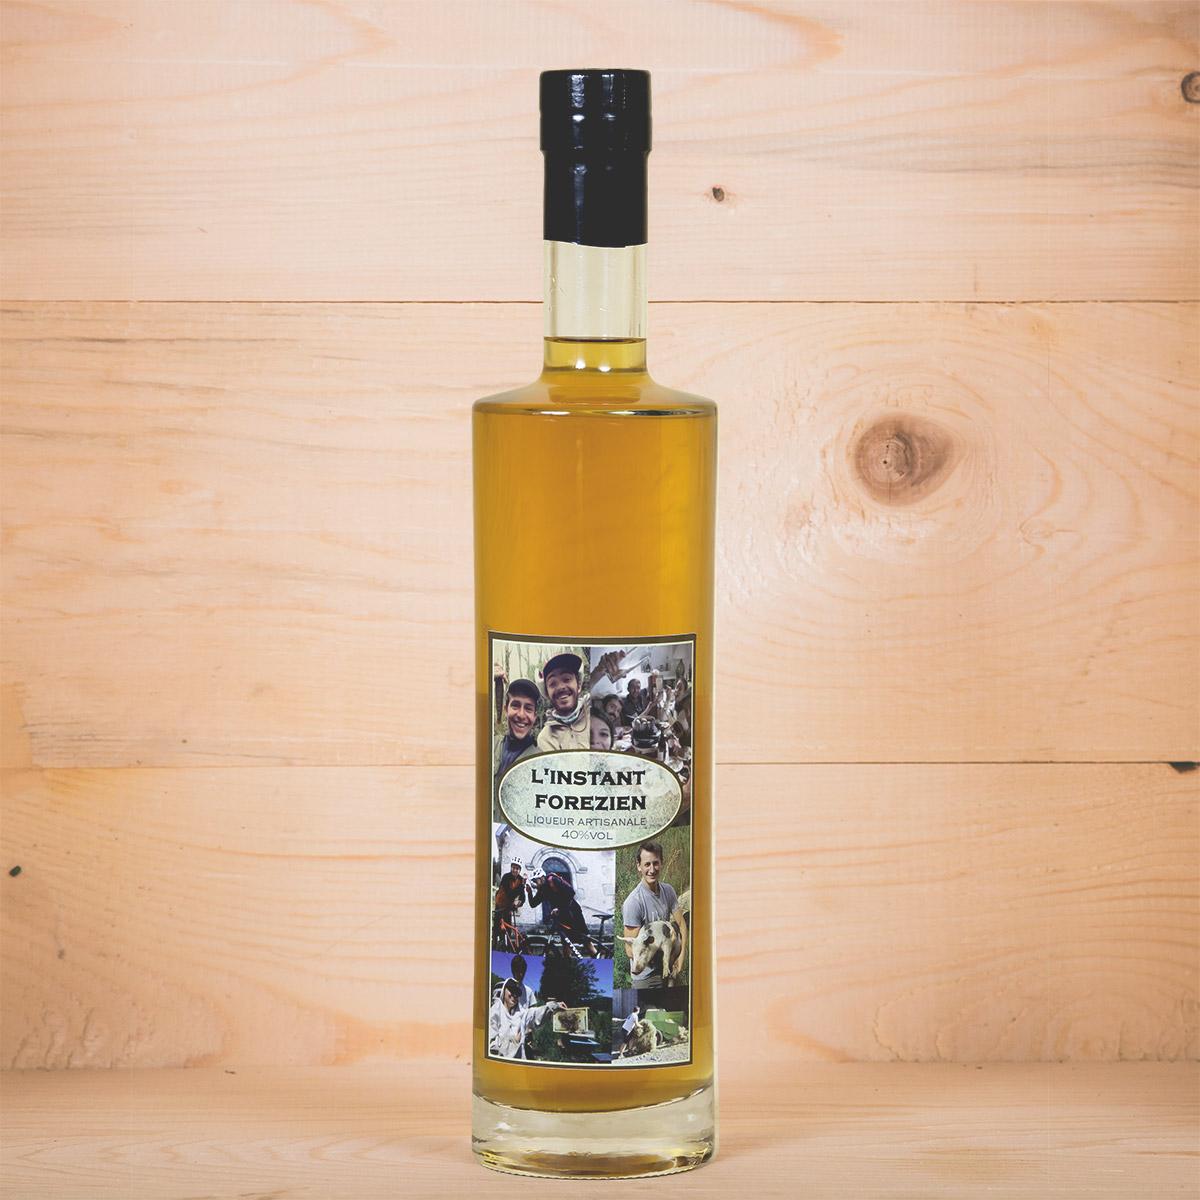 https://www.lasource-distillerie.fr/wp-content/uploads/2019/10/bouteille-instant-forezien-la-source-distillerie-1200px.jpg